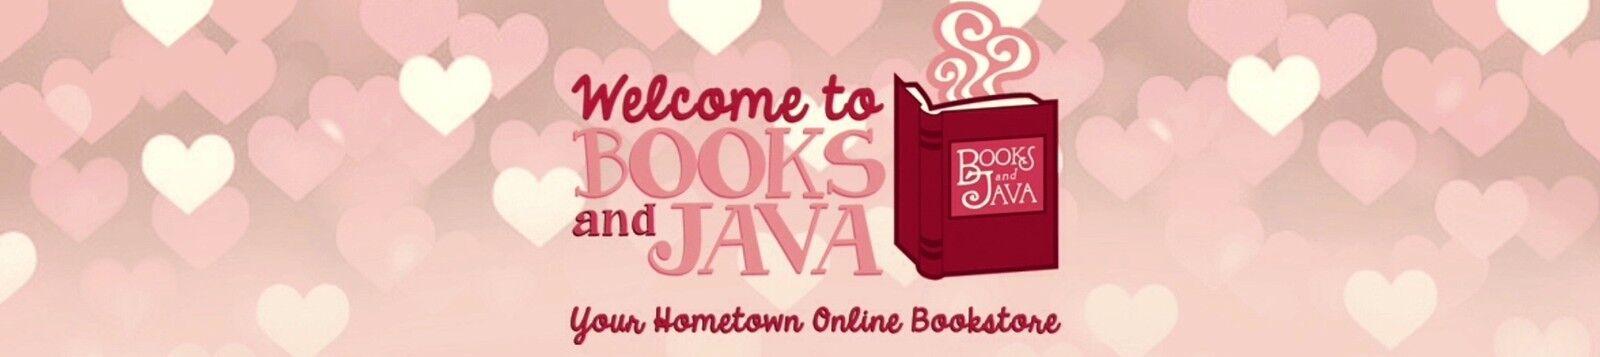 Books and Java